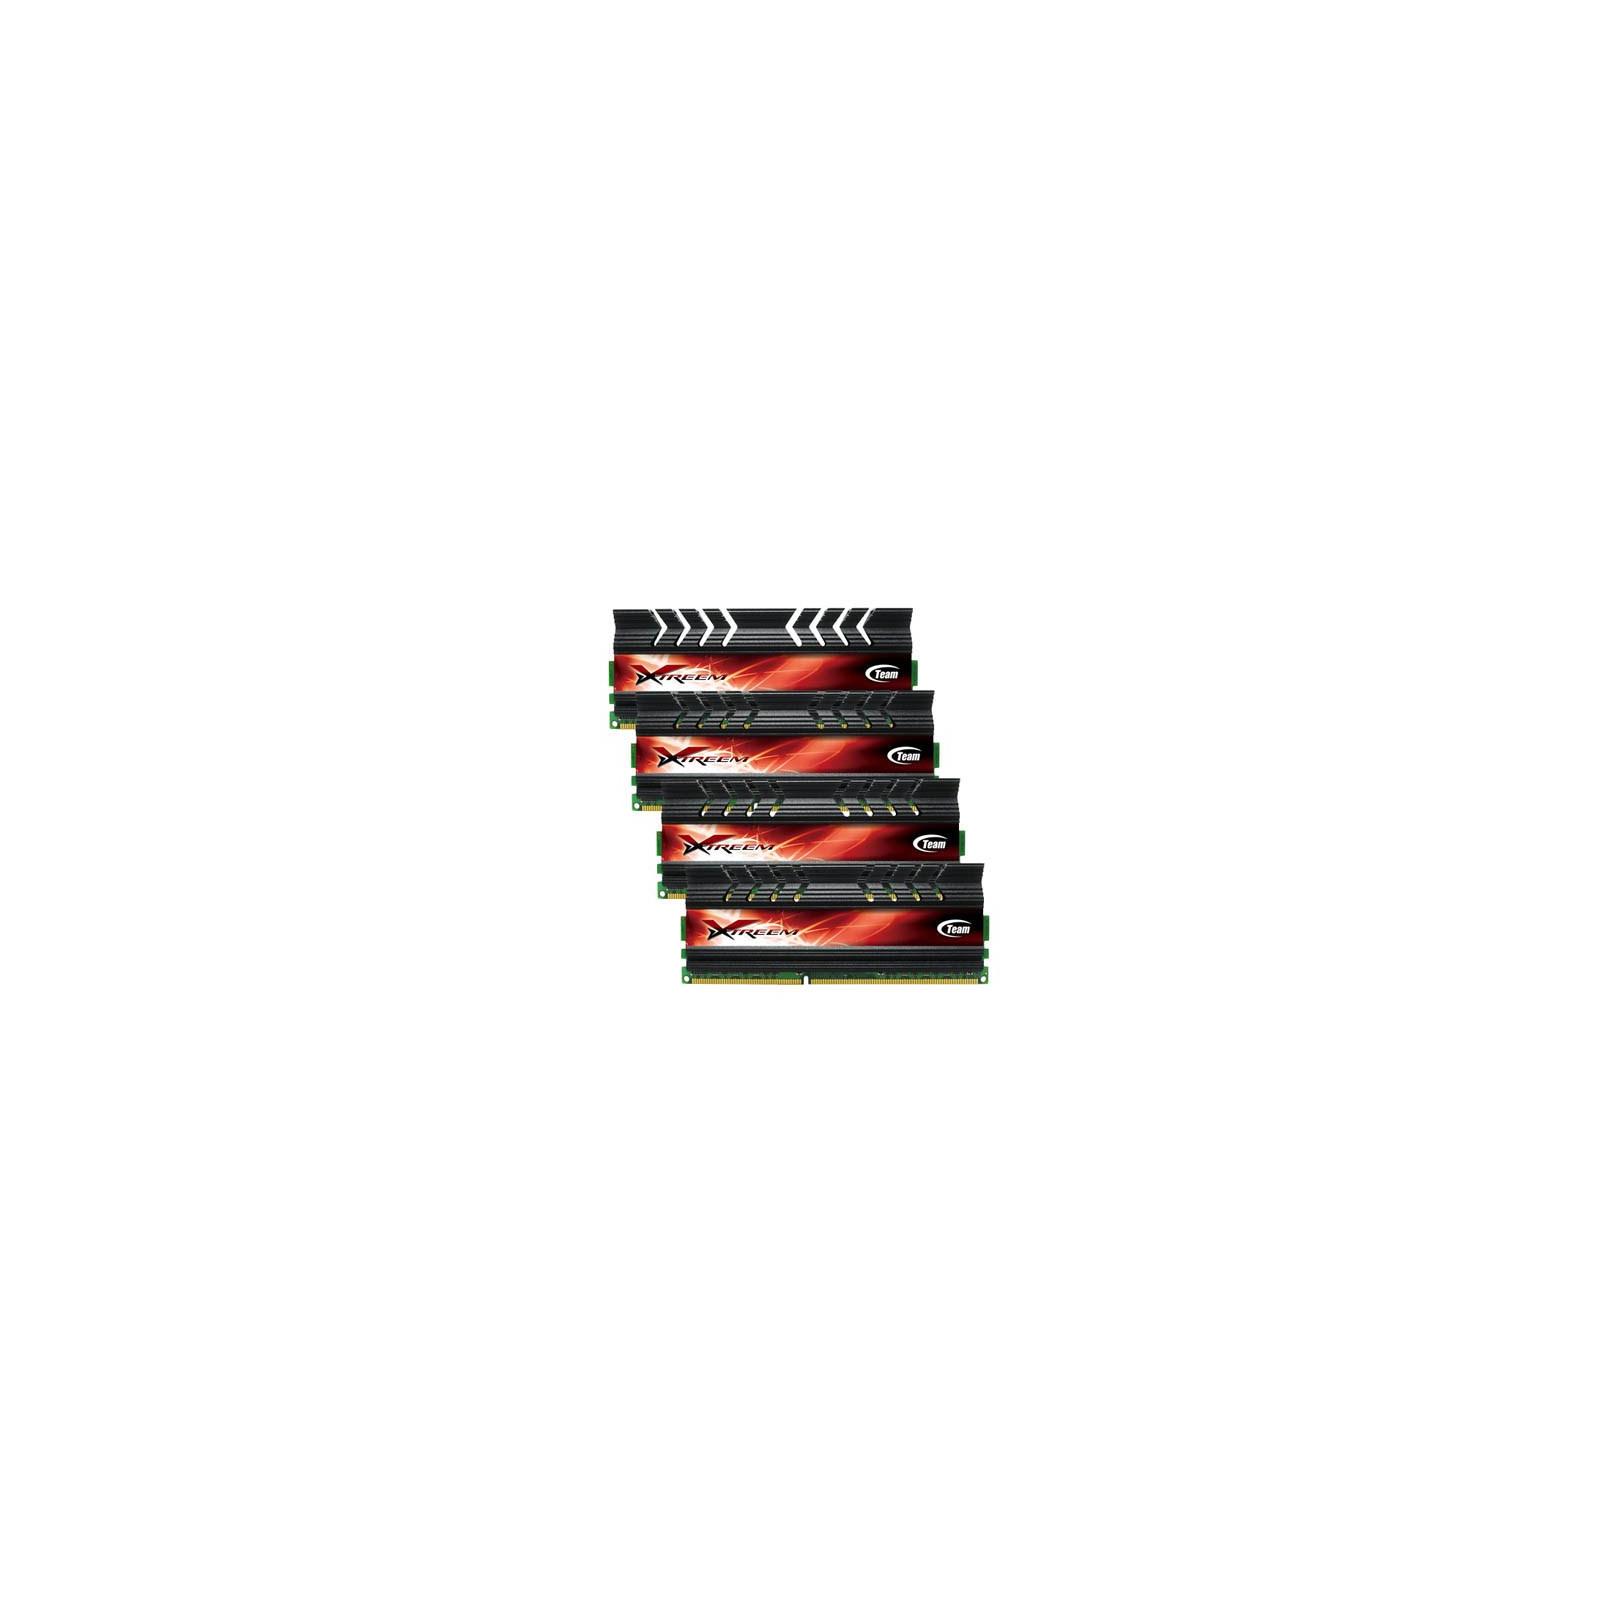 Модуль памяти для компьютера DDR3 16GB (4x4GB) 2400 MHz Team (TXD316G2400HC11QC01)